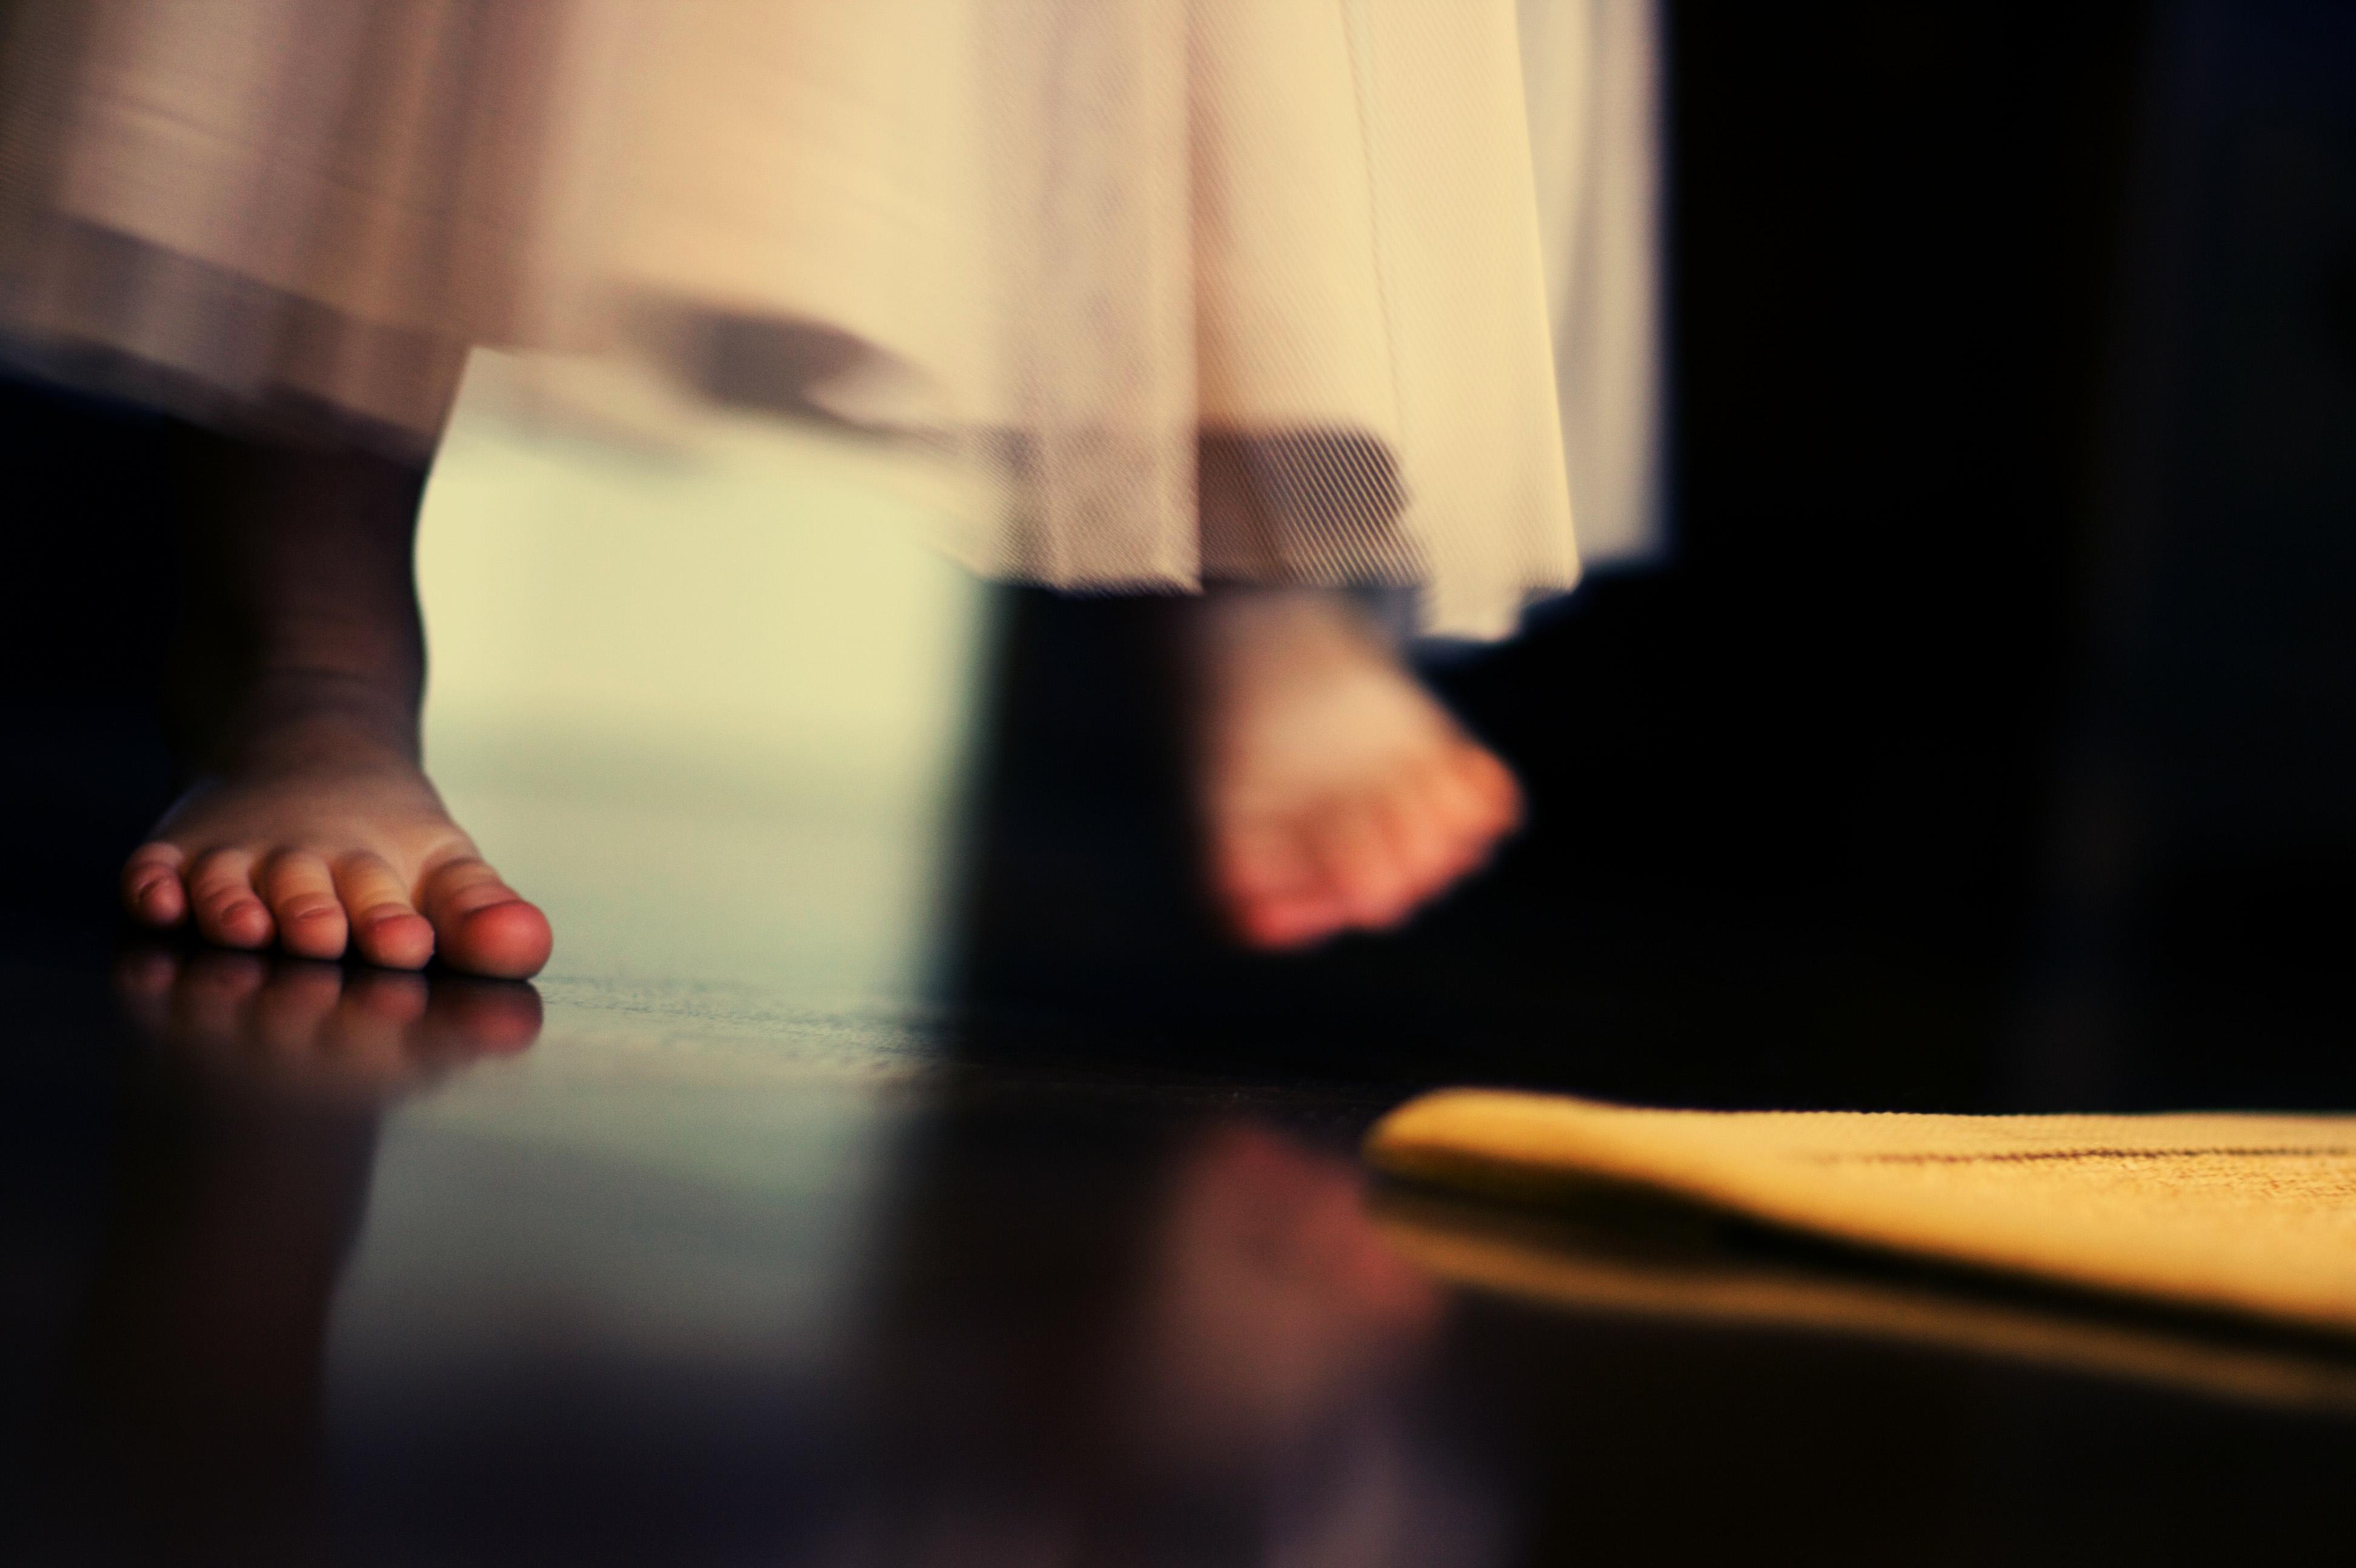 feet-713